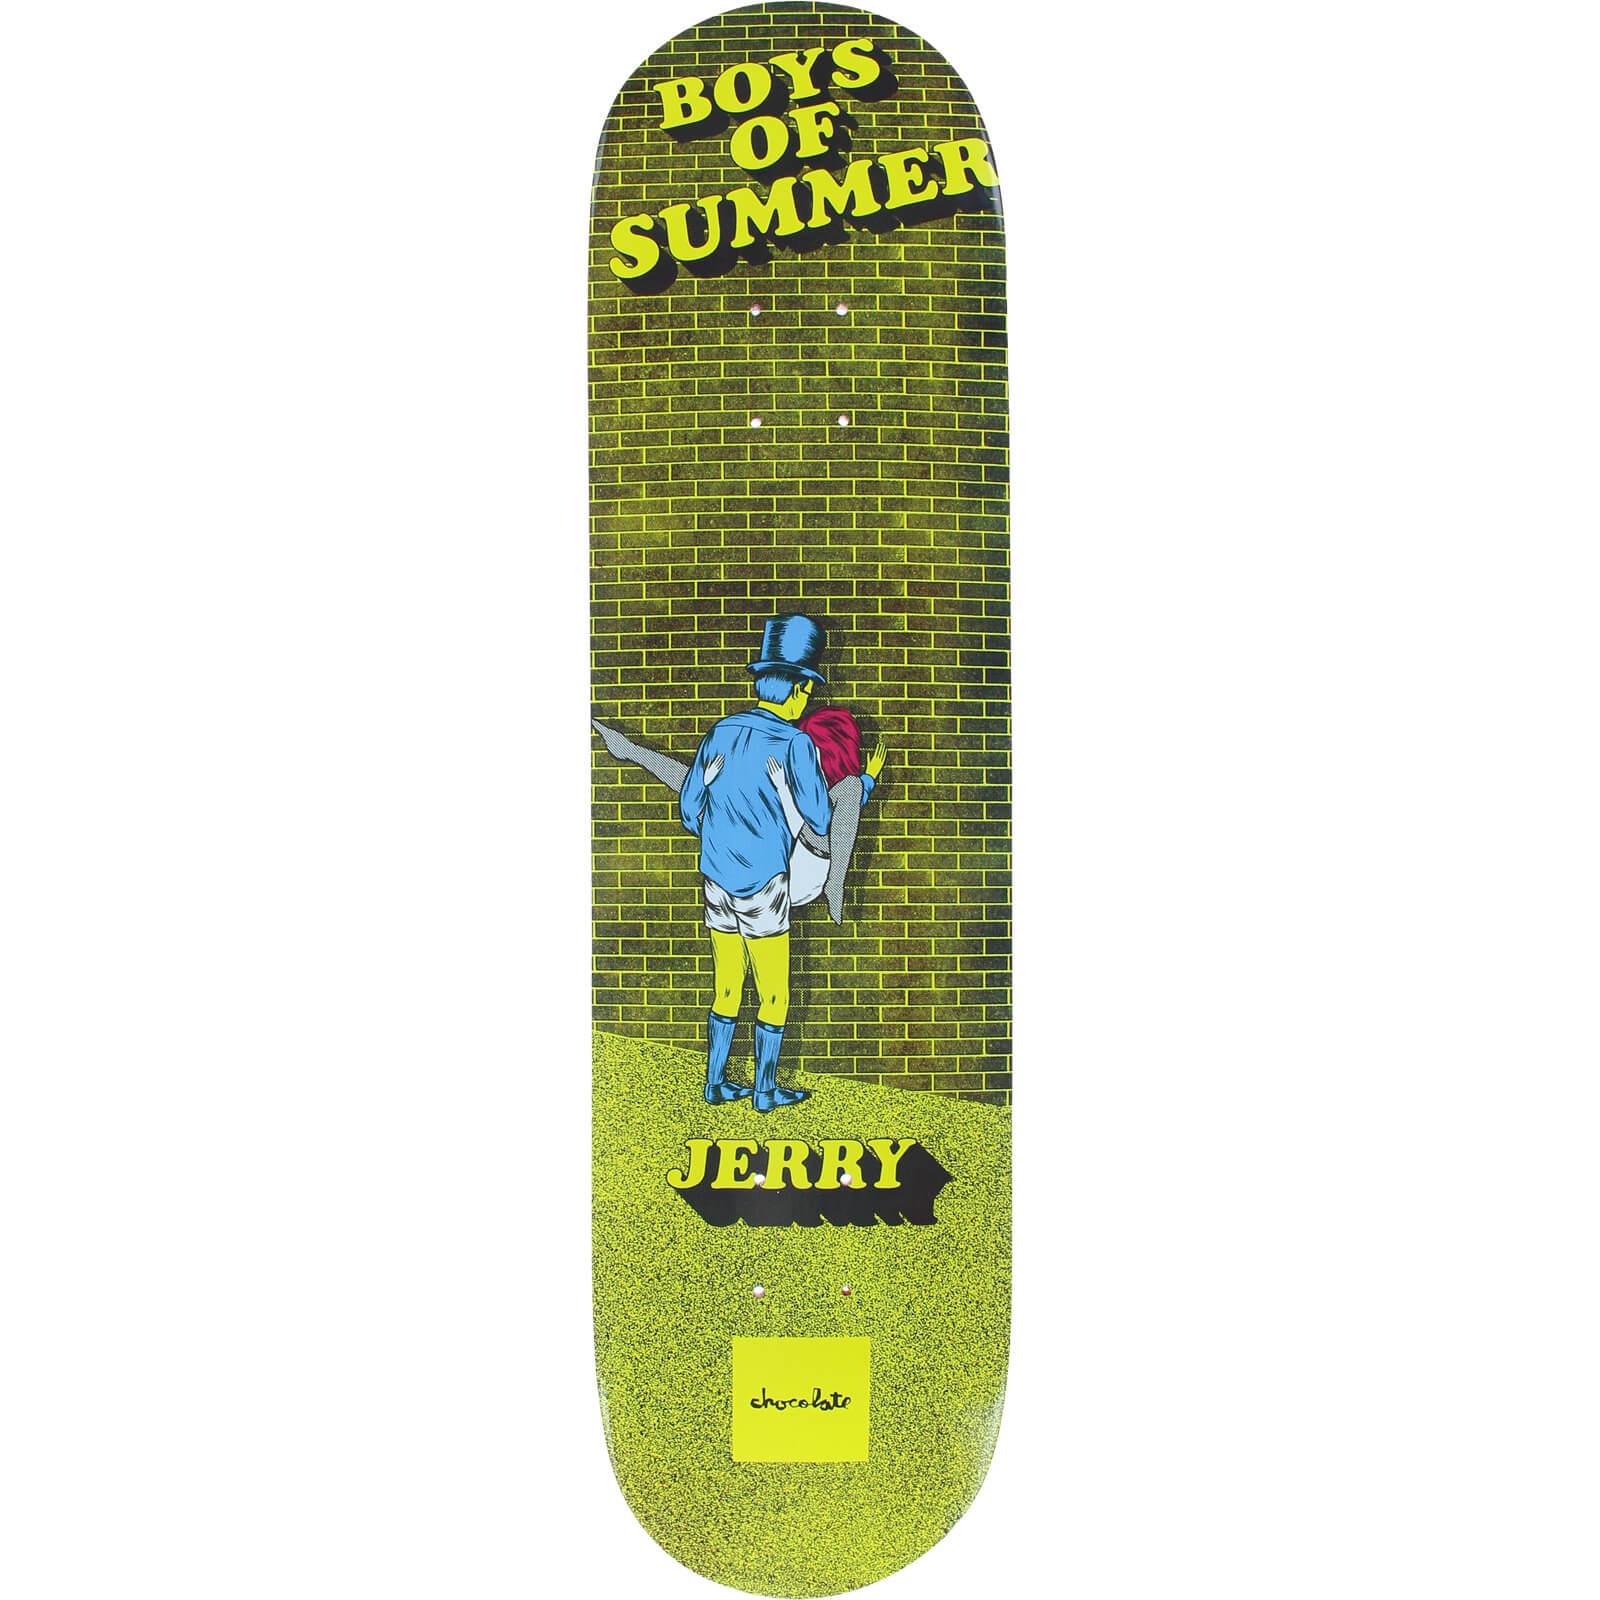 Chocolate Skateboards Boys Of Summer Deck